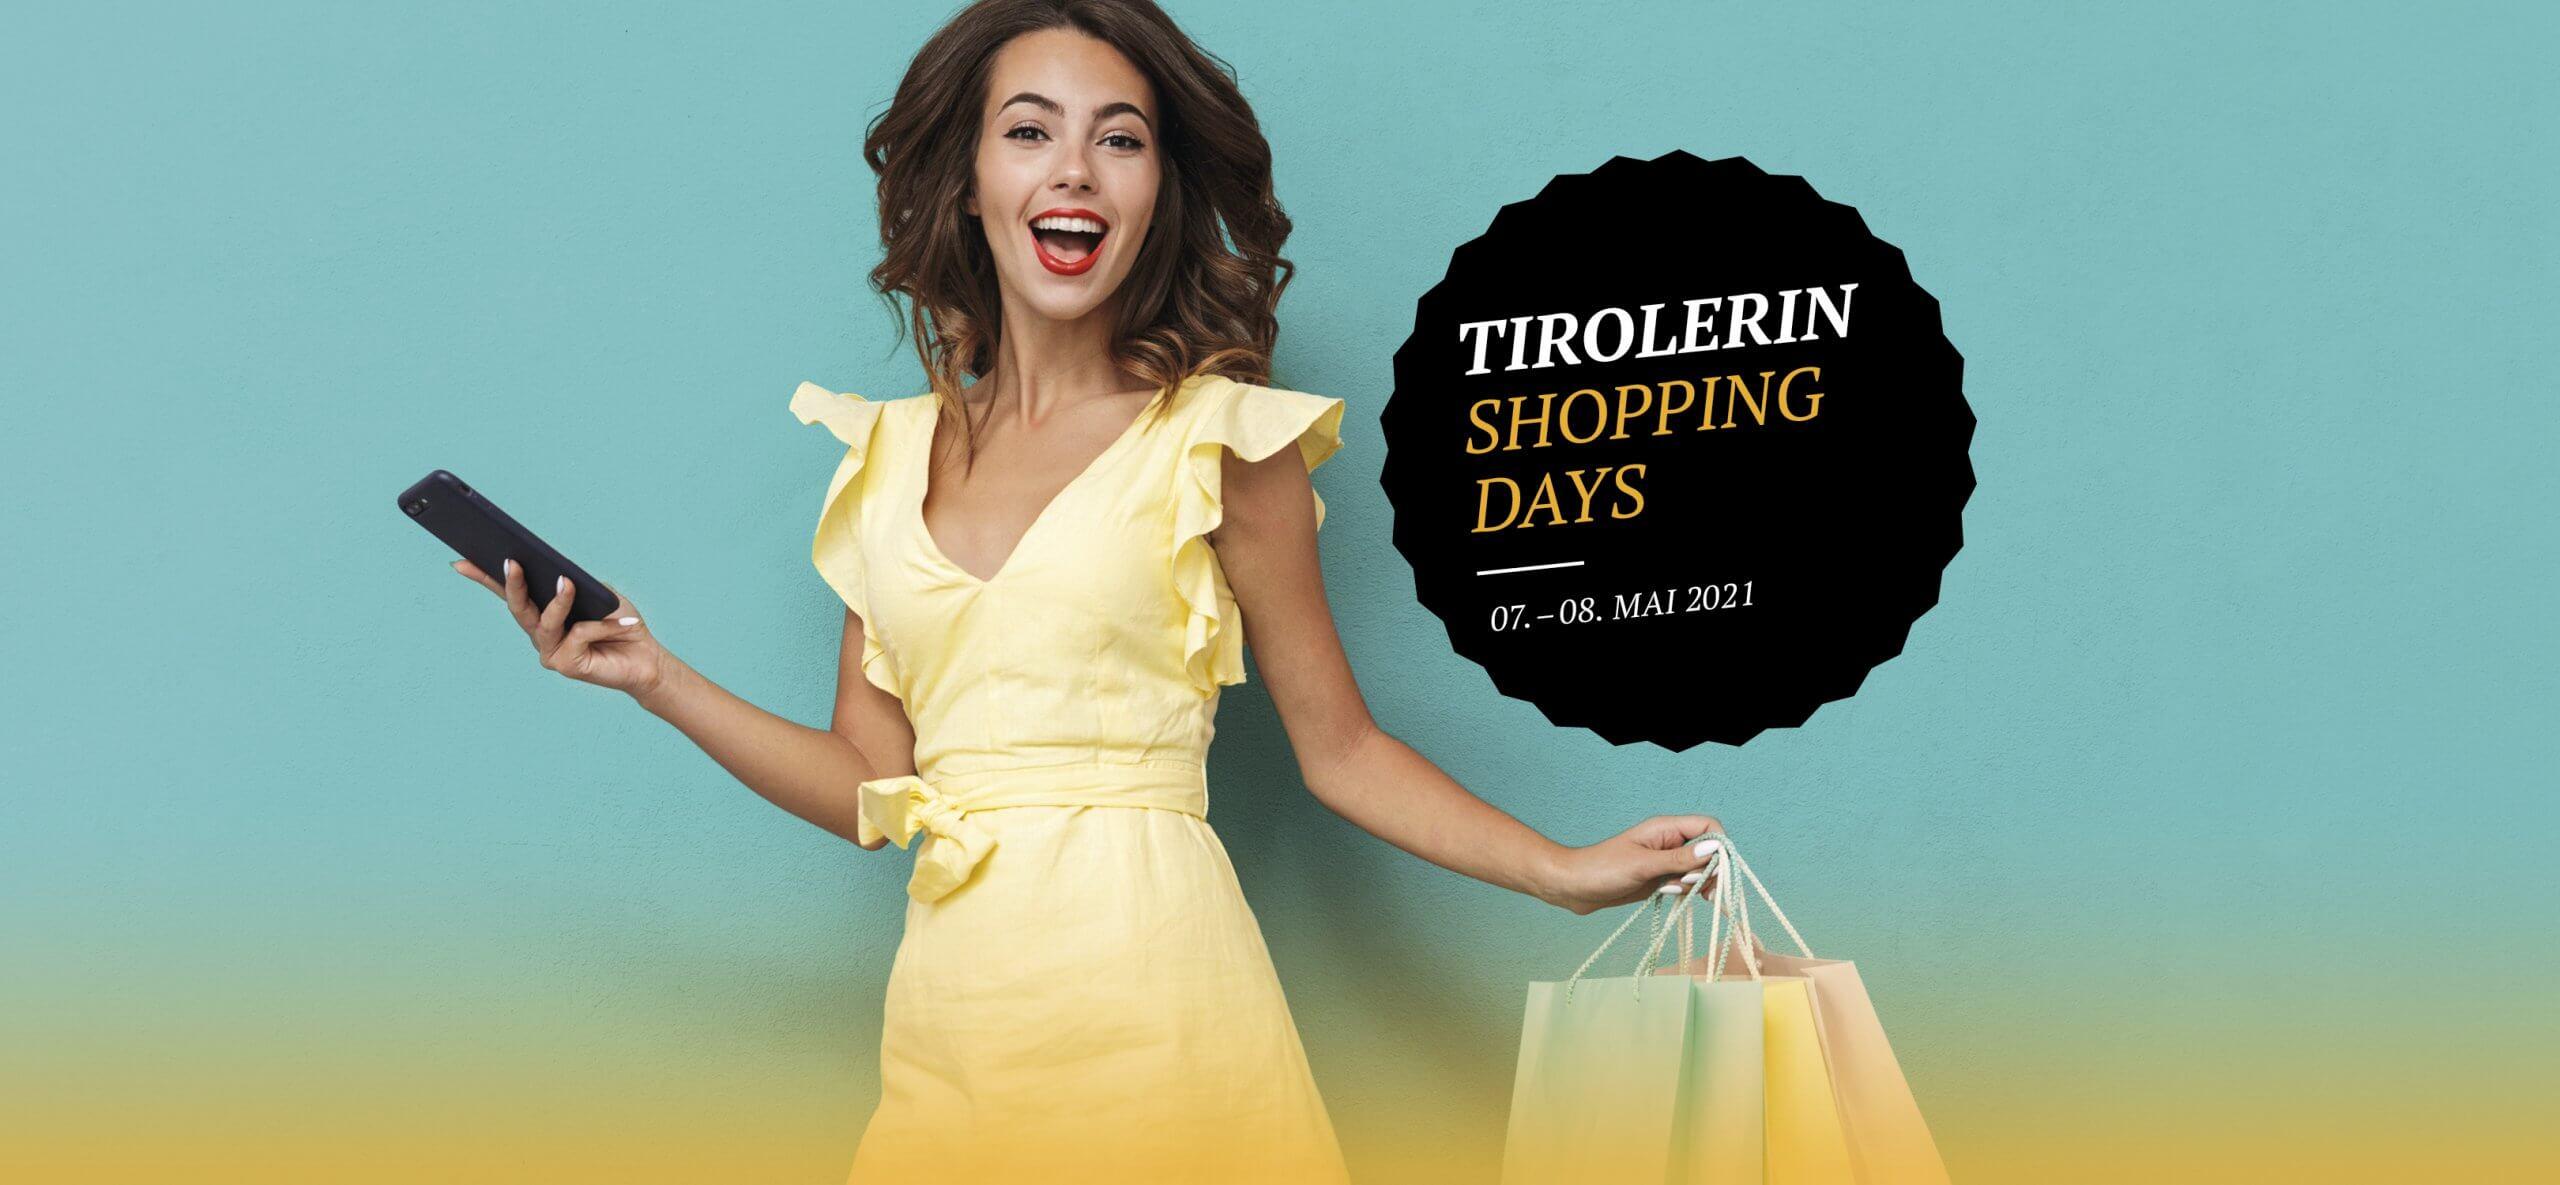 Tirolerin Shopping Days